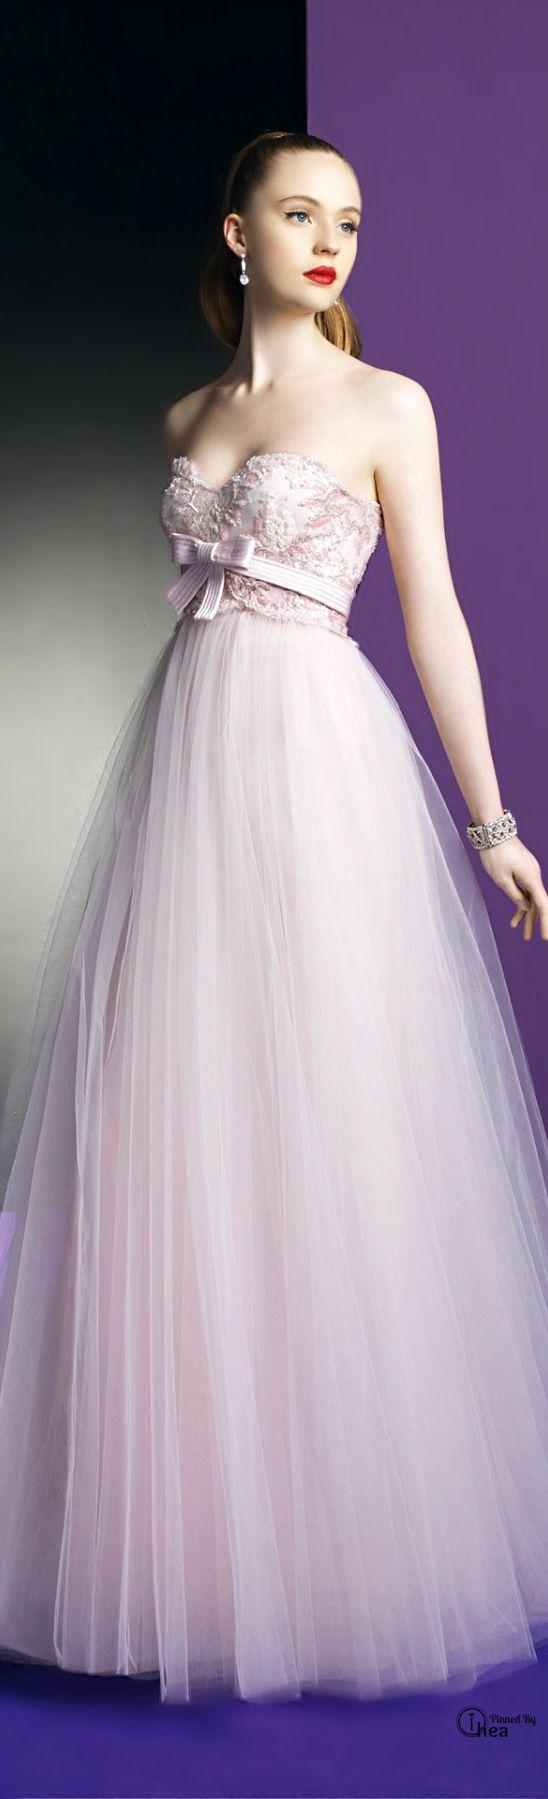 Gorgeous pink dress | Ball gowns, Beautiful dresses, Dresses